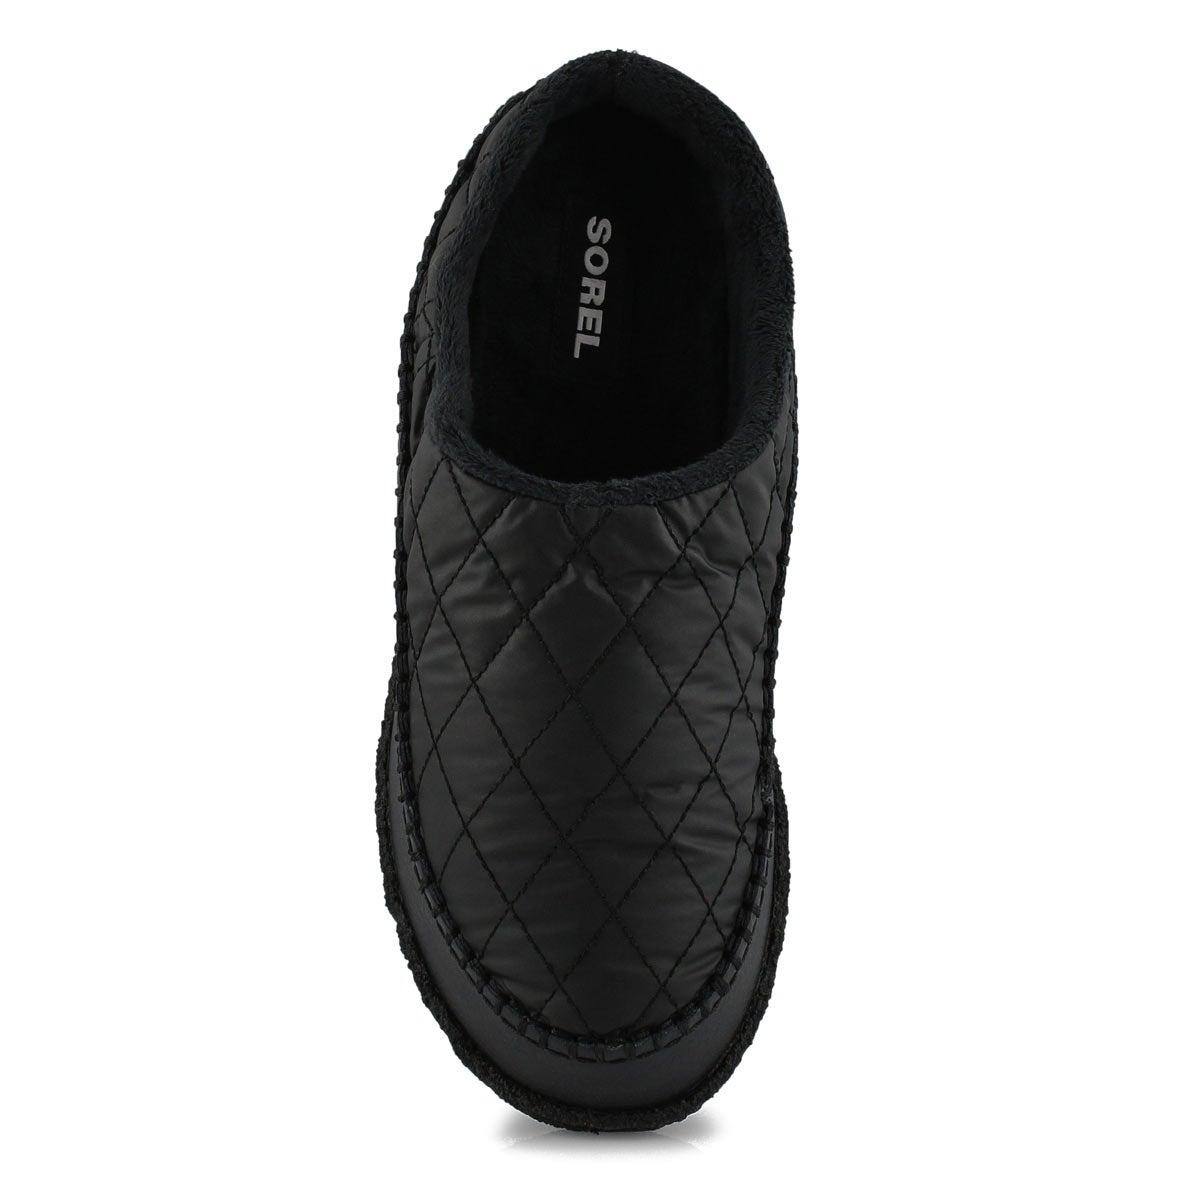 Men's Falcon Ridge II Slipper - Black